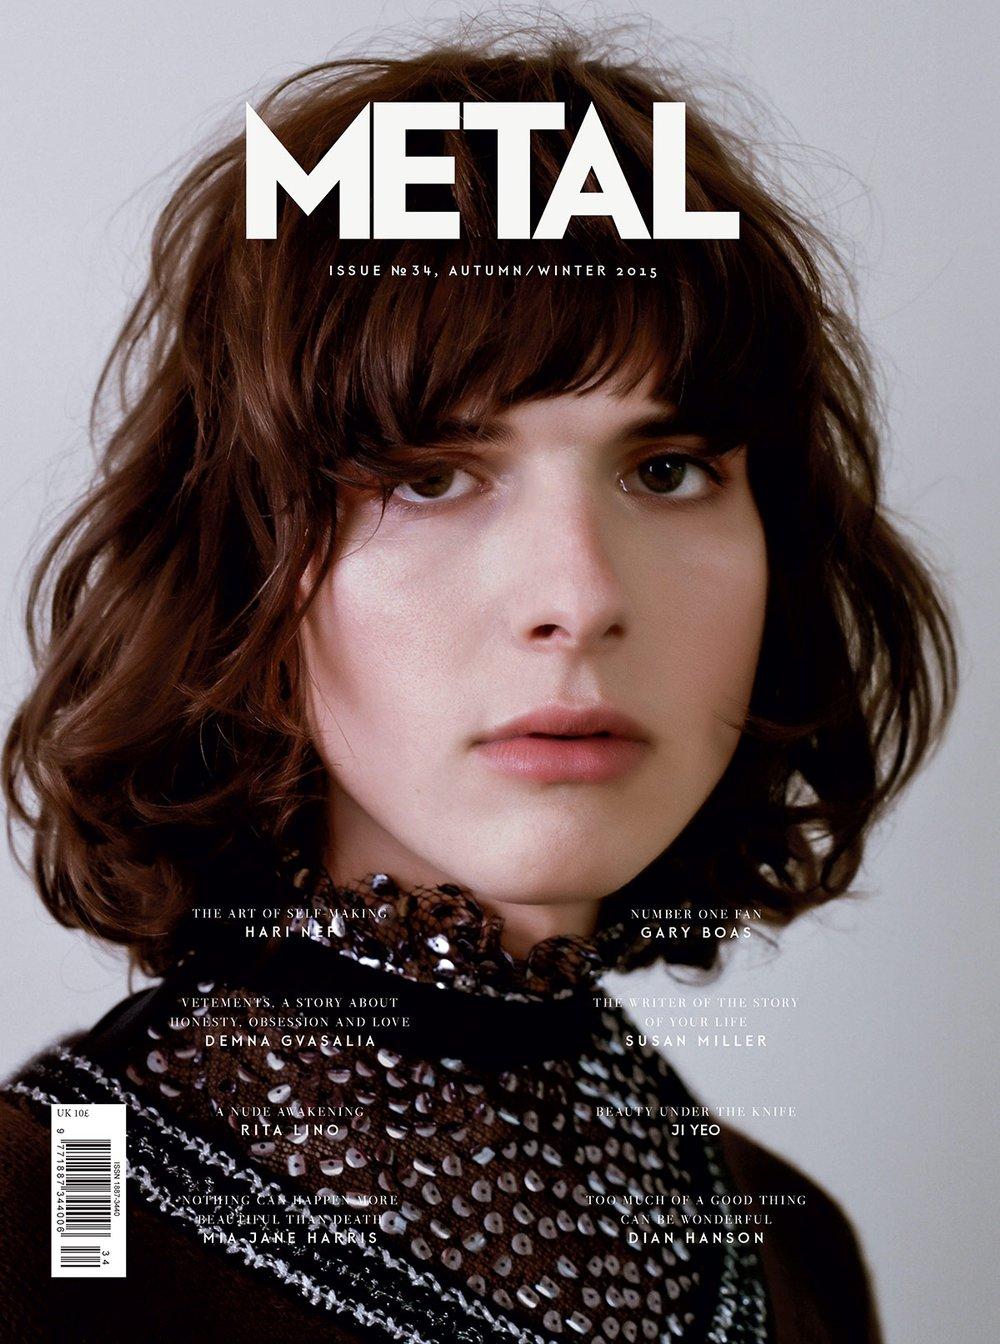 COVER 3 - Hari Nef (IMG) wearing Rodarte by Tina Tyrell.